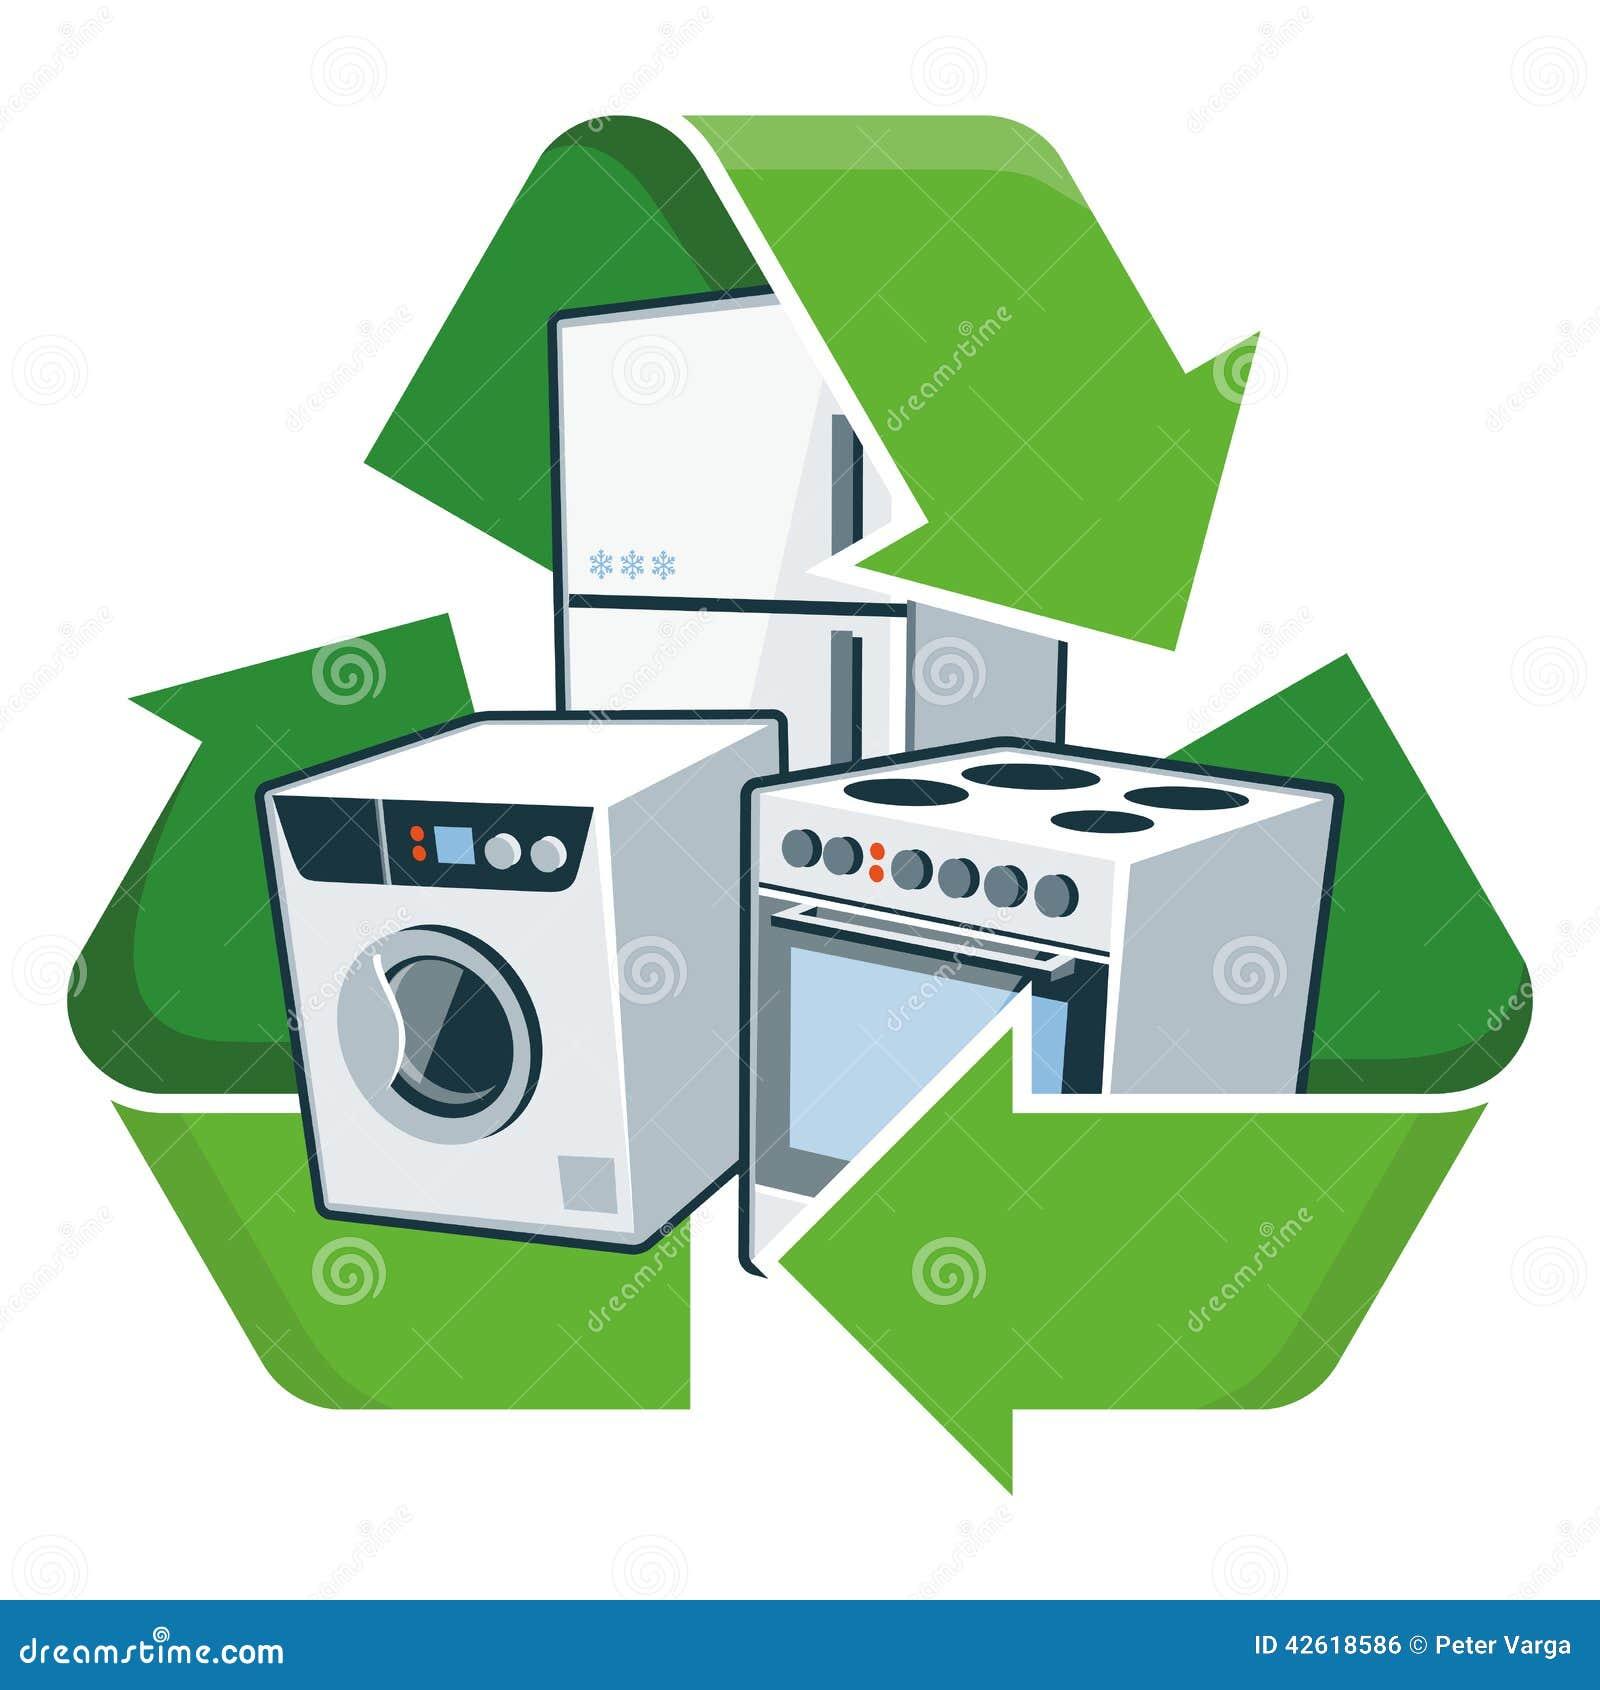 Recycle large electronic appliances stock vector illustration of recycle large electronic appliances buycottarizona